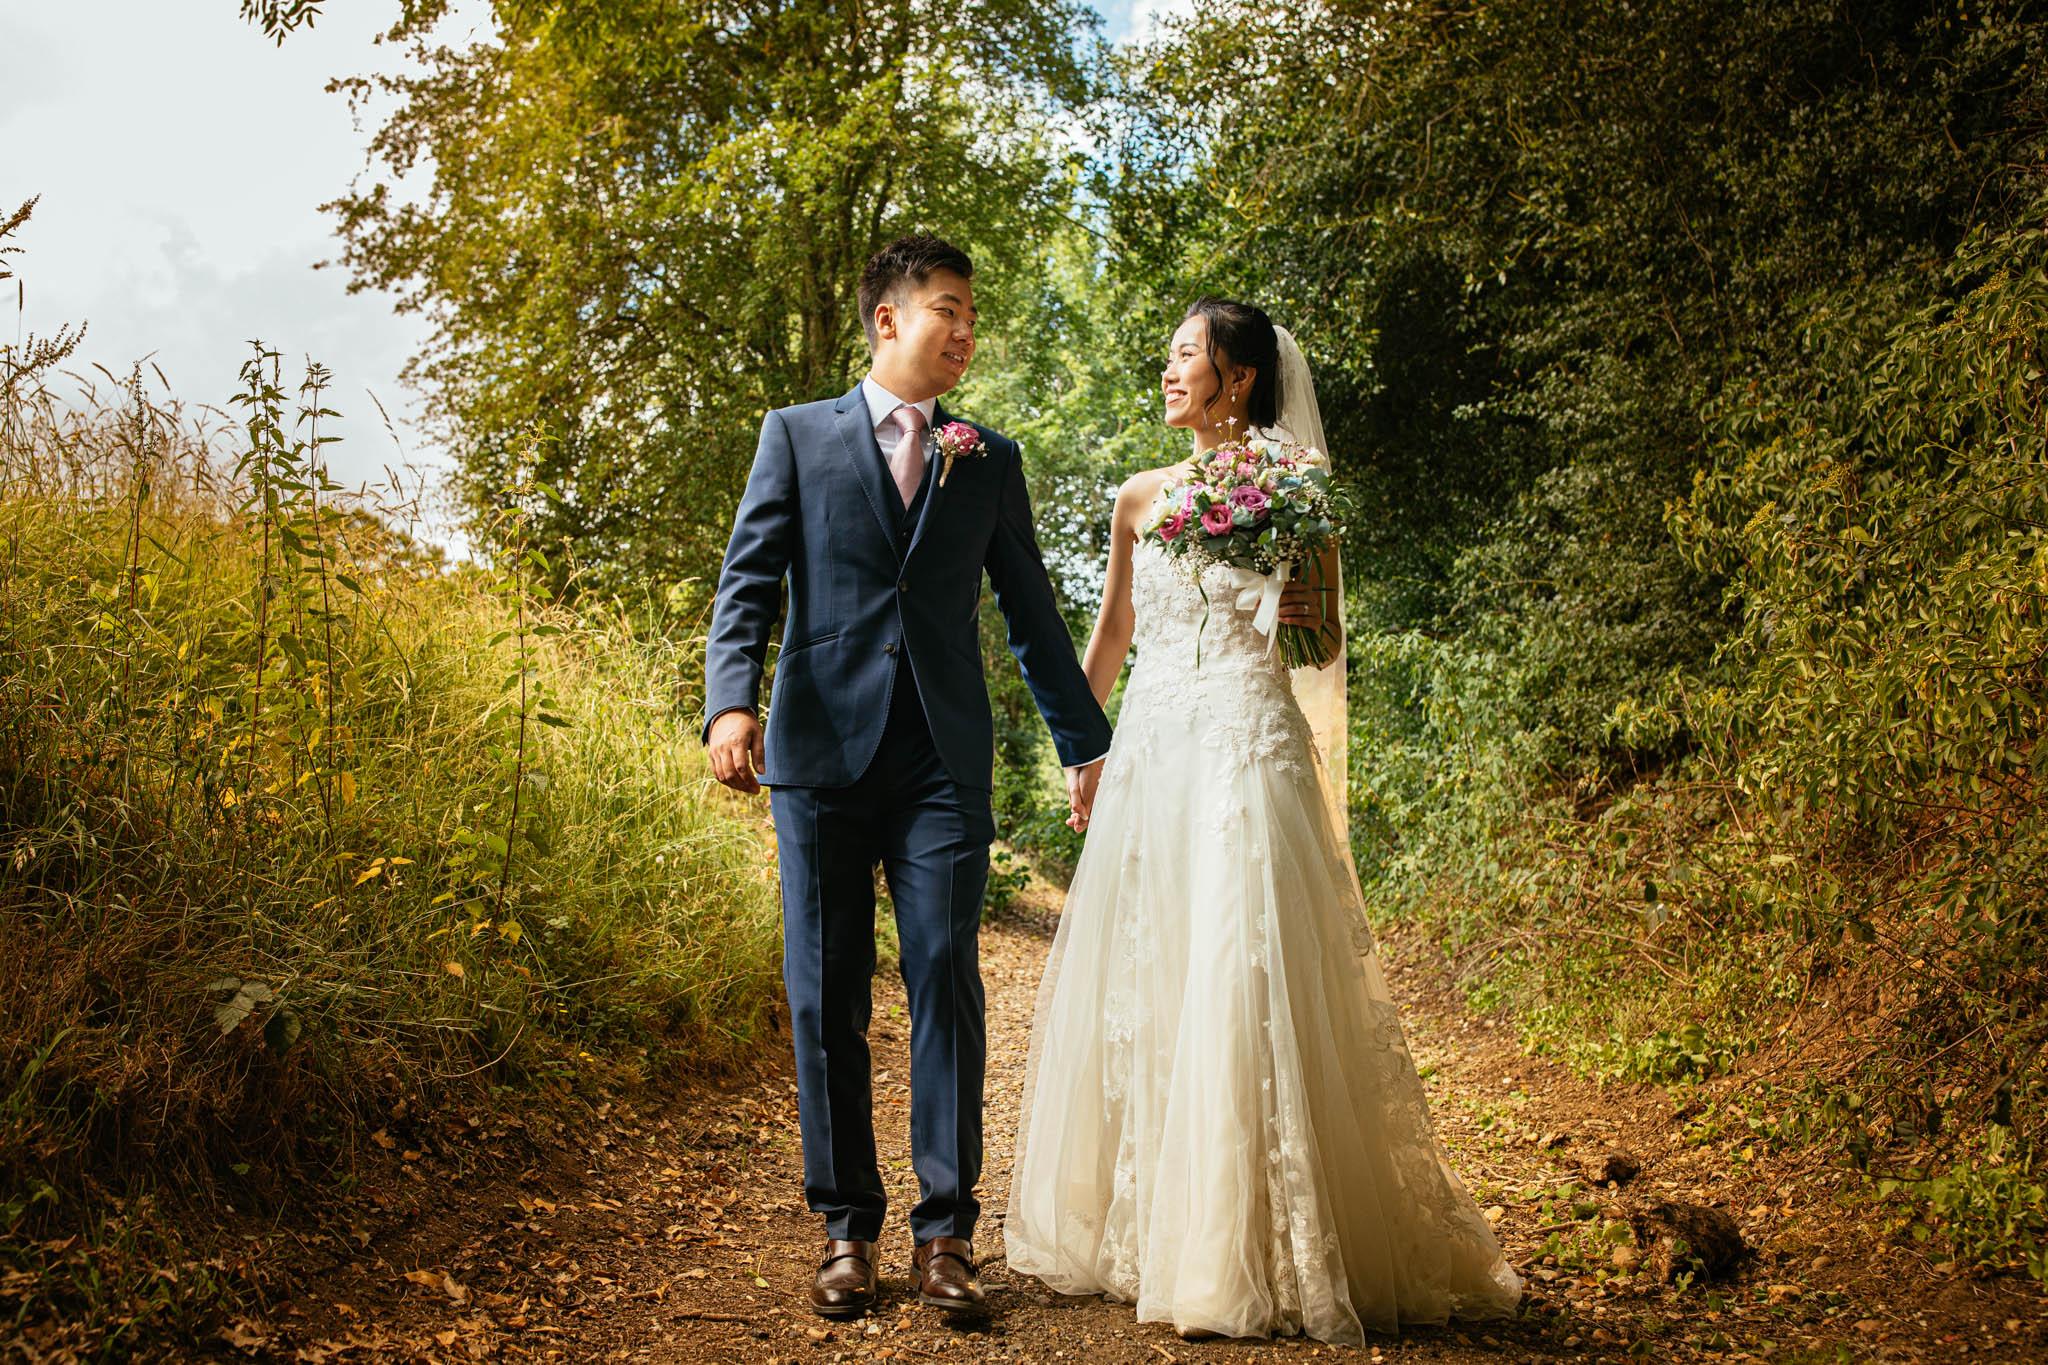 Tewin Bury Farm: Yiling & Stephen Wedding Photo